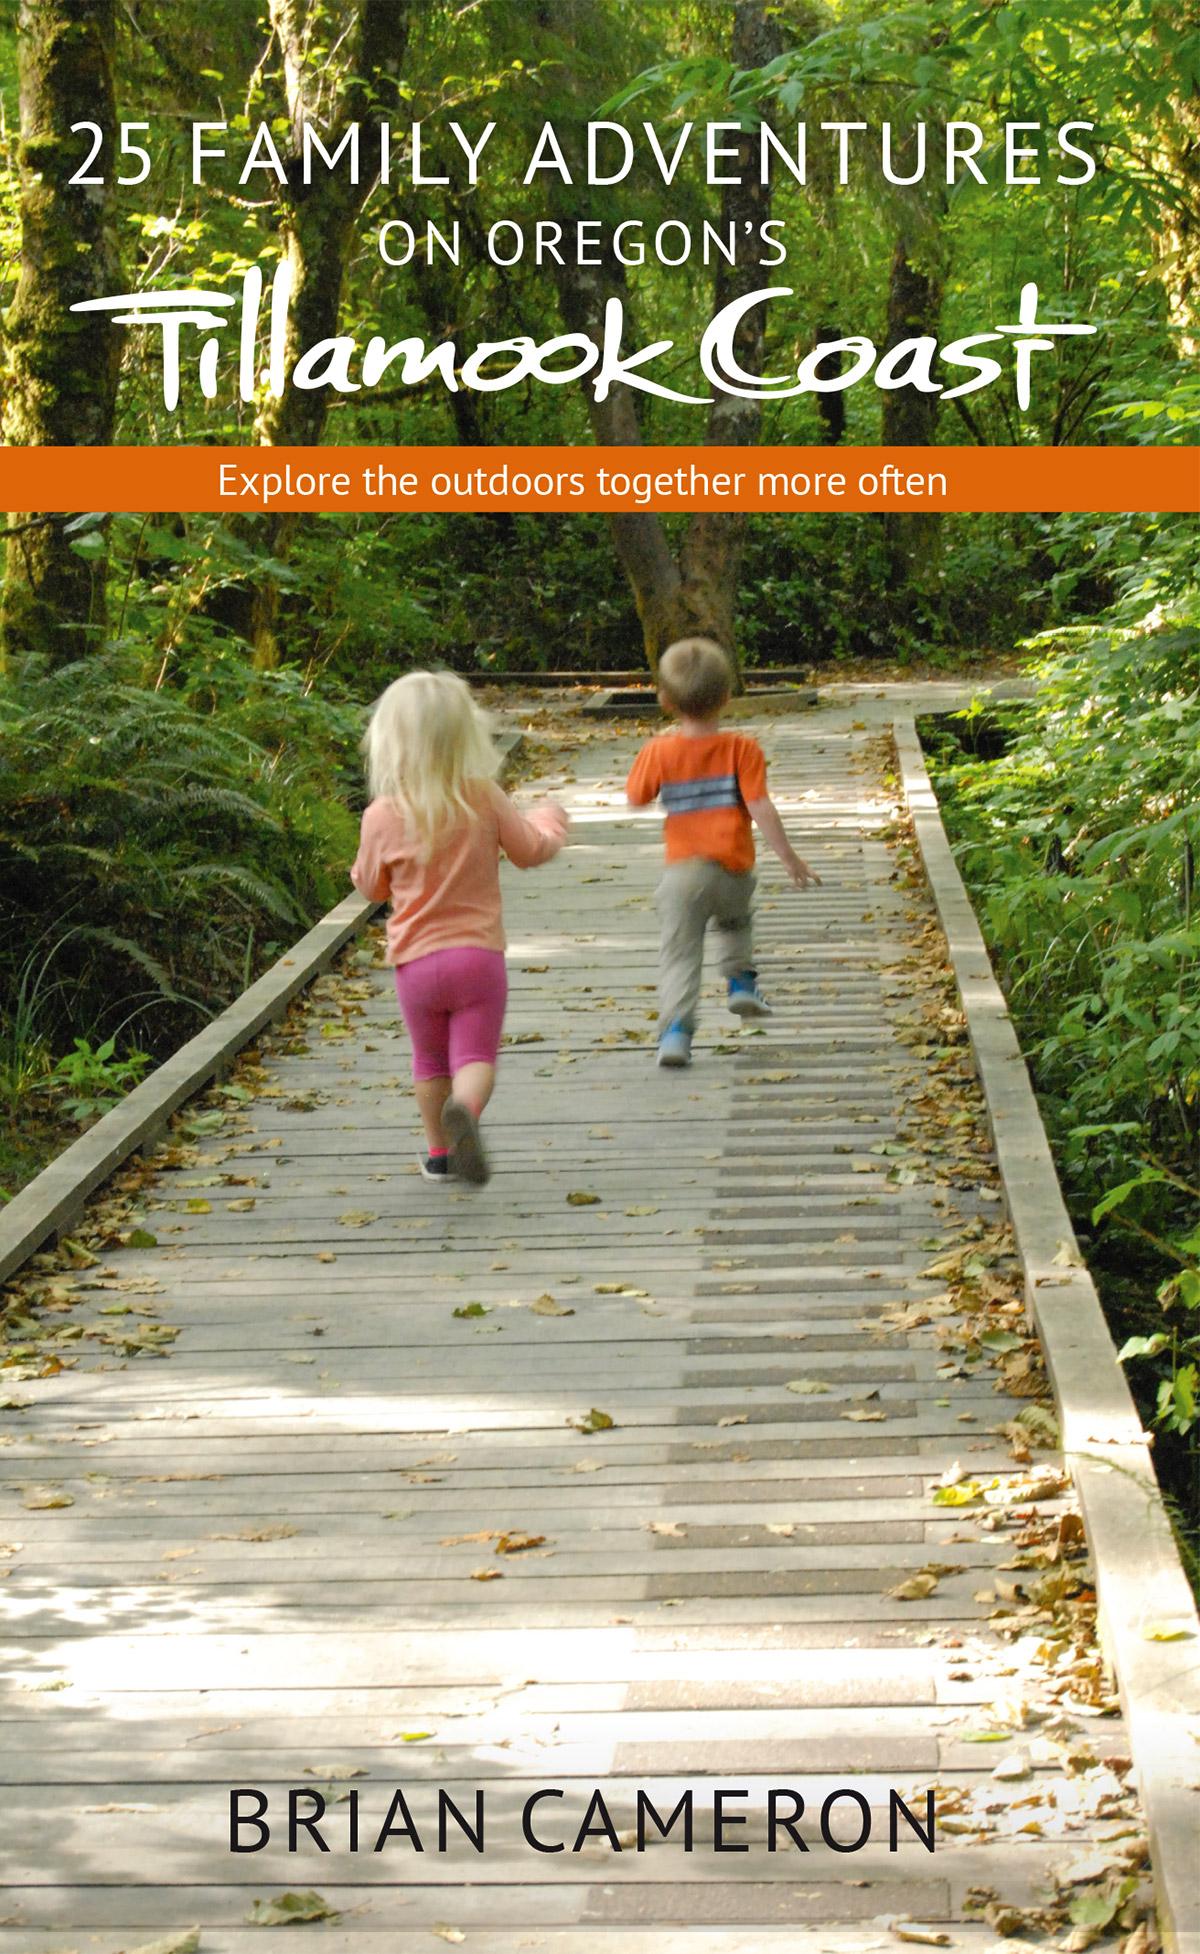 25 Family Adventures on the Tillamook Coast